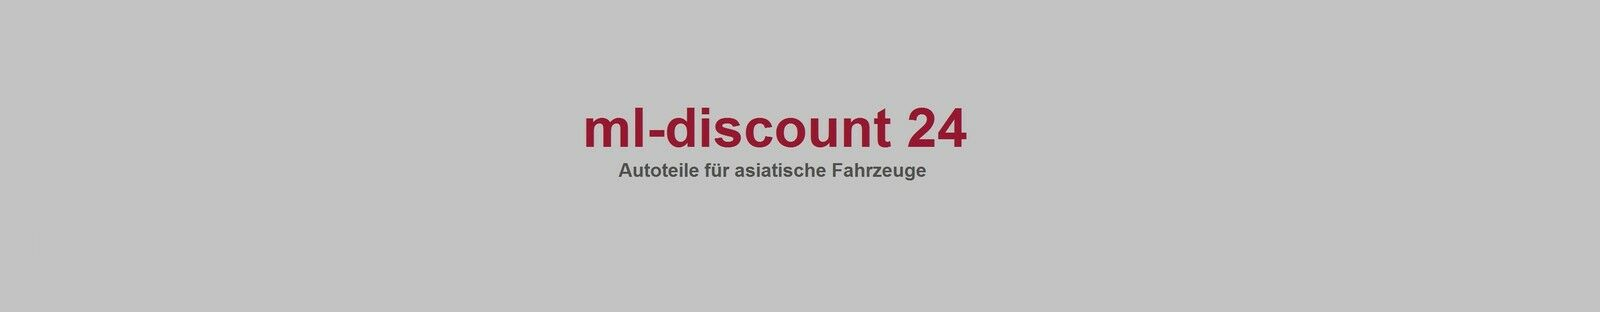 ml-discount24